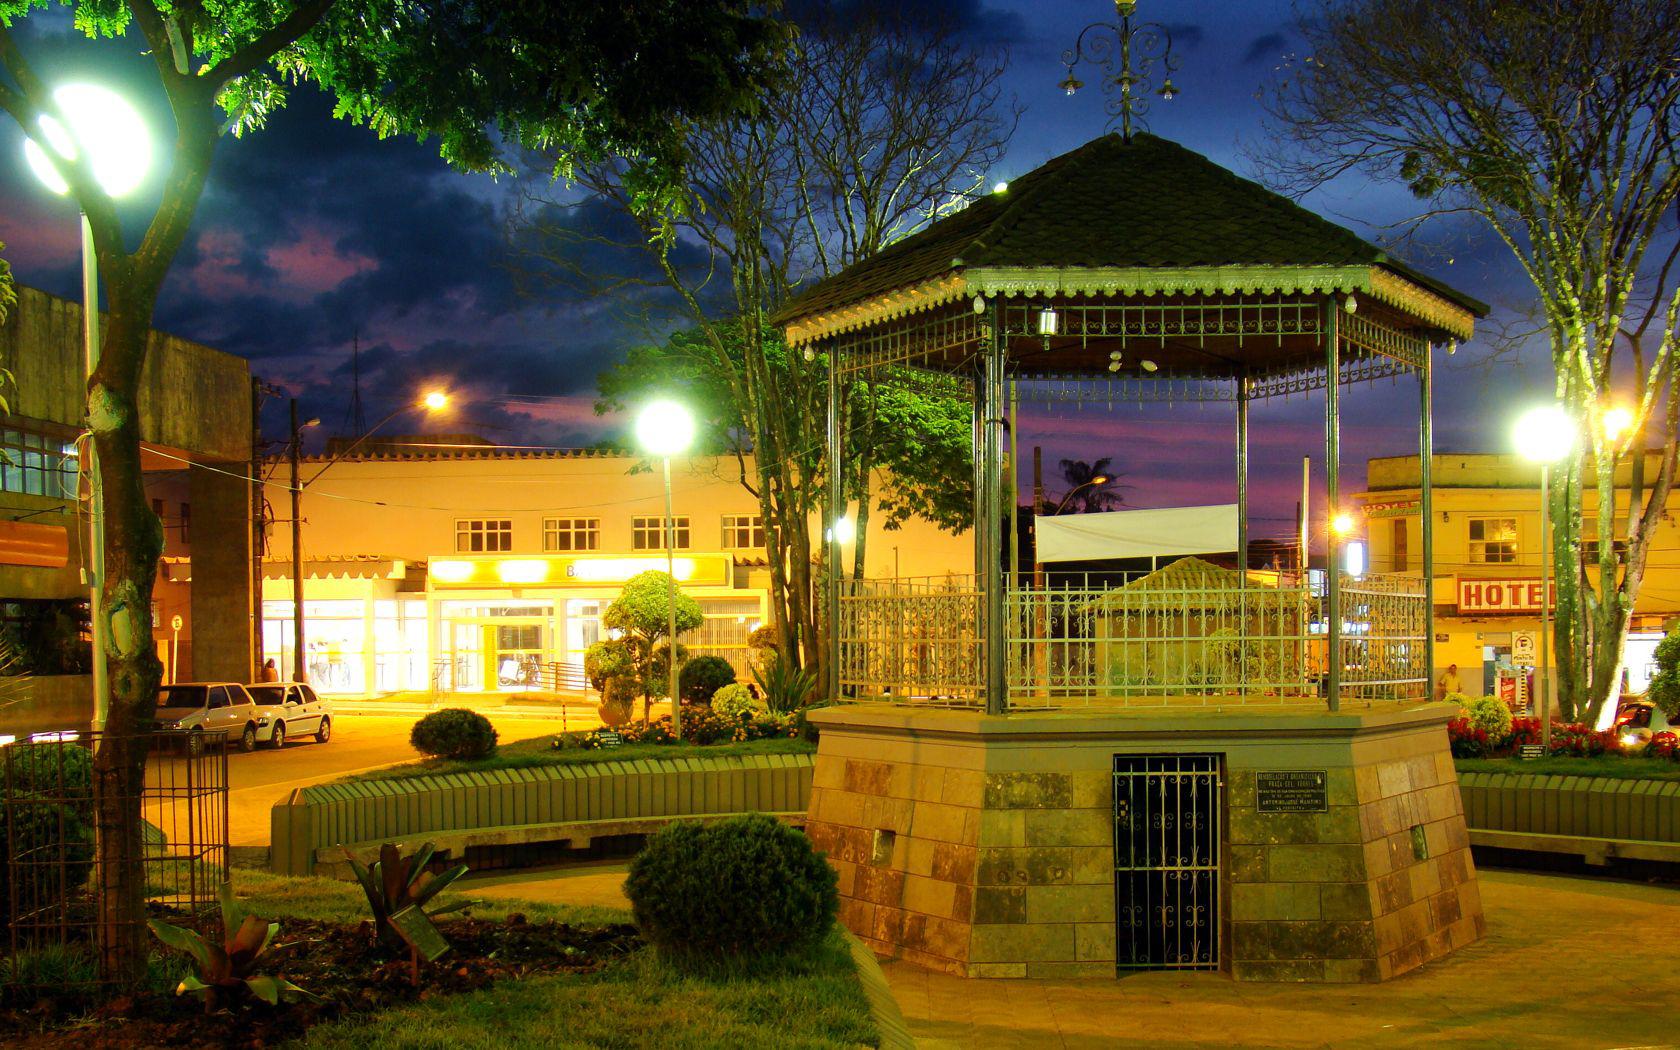 """Praça coronel torre bambuí"" por THIAGO REMIGGI - FOTO DIGITAL. Licenciado sob CC BY-SA 3.0 via Wikimedia Commons."